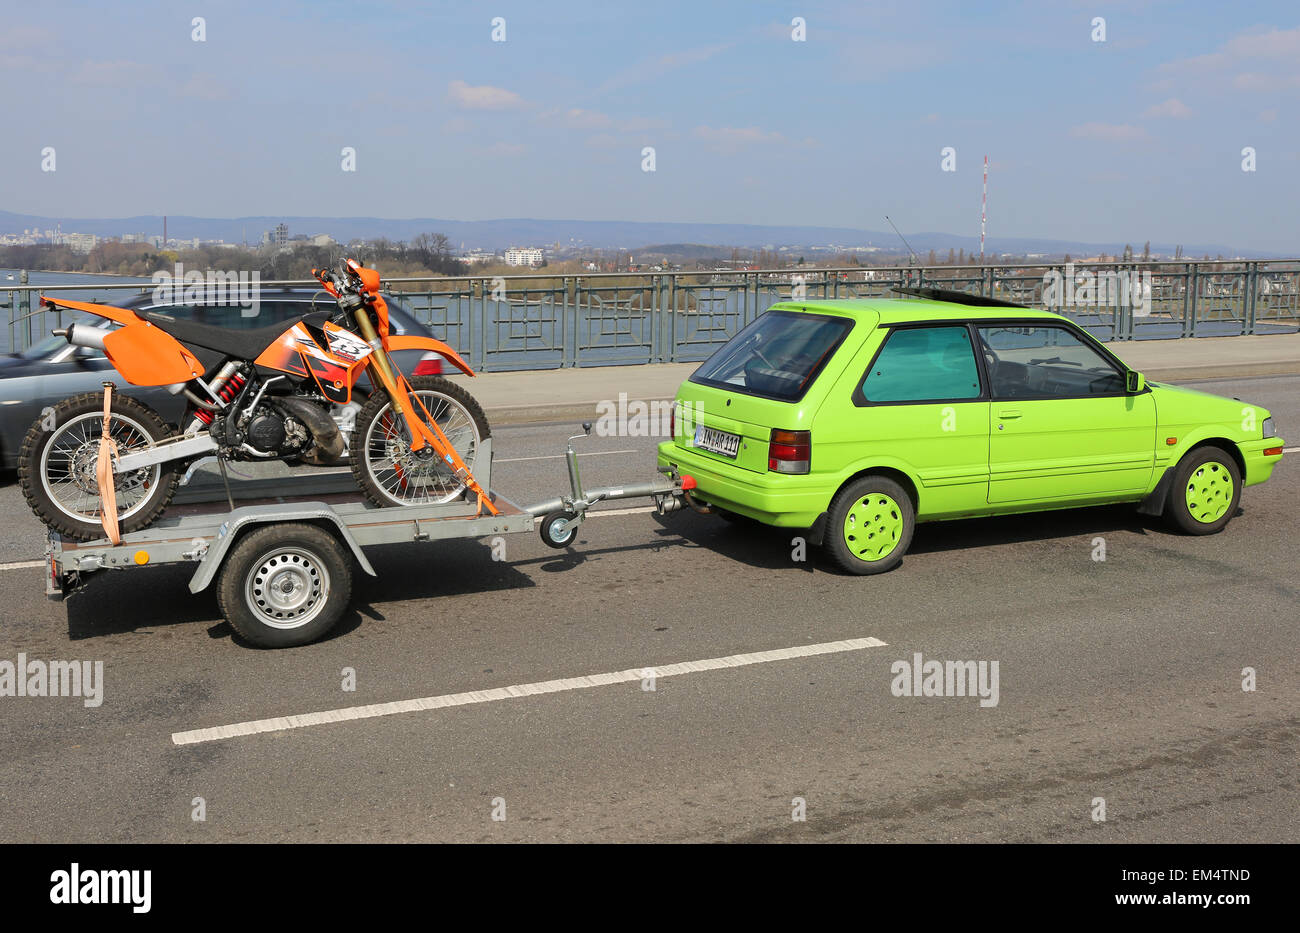 Green Car with Orange Dirt Bike on Theodor Heuss Bridge - Stock Image